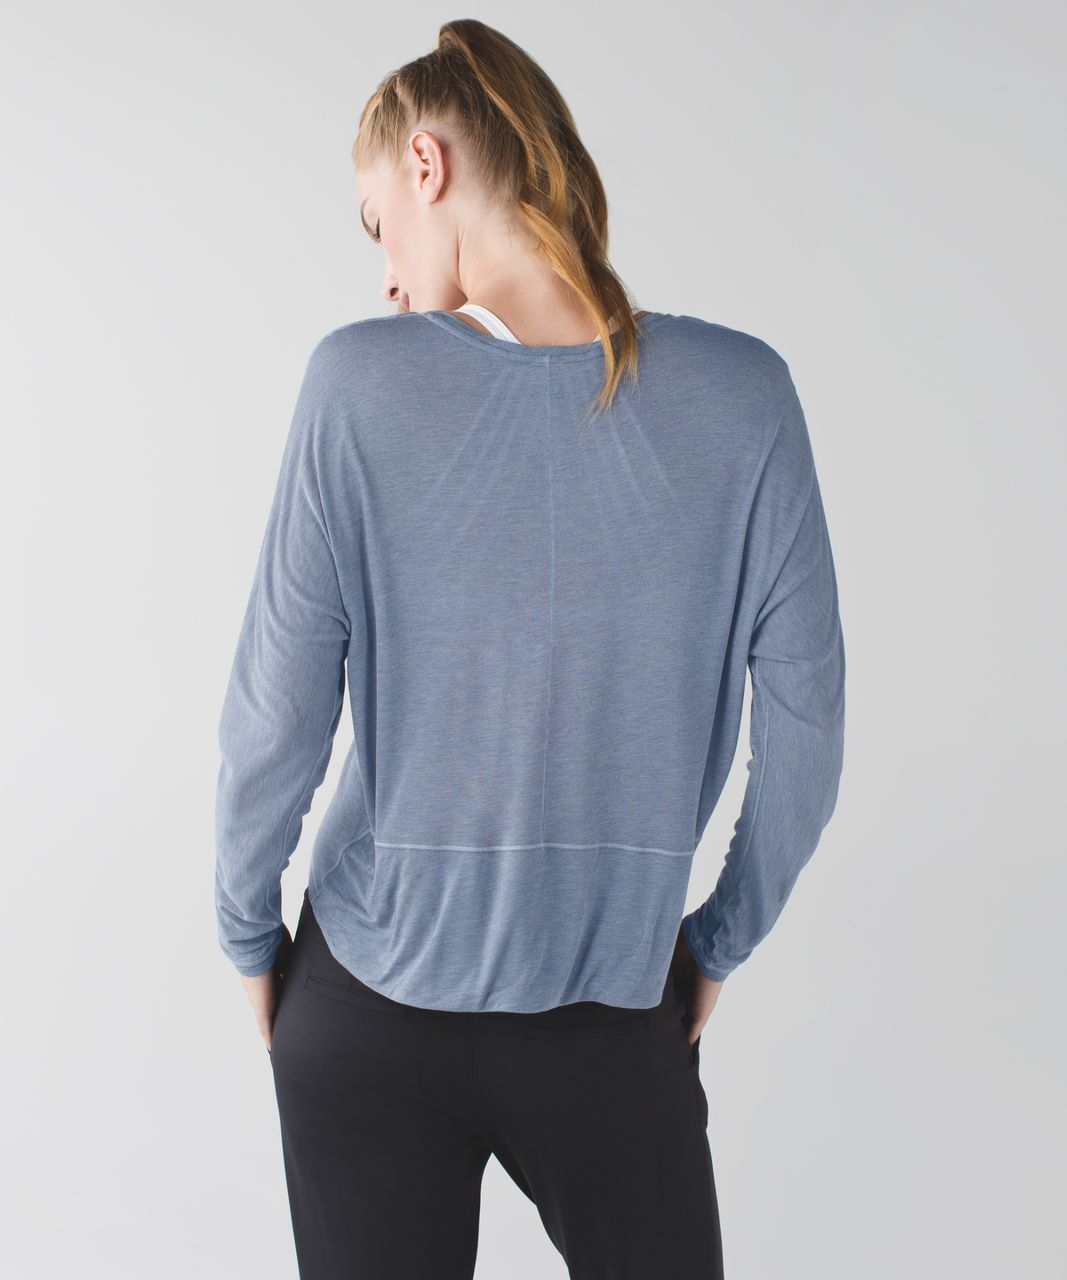 Lululemon Made To Layer Long Sleeve Tee - Heathered Mod Blue Denim